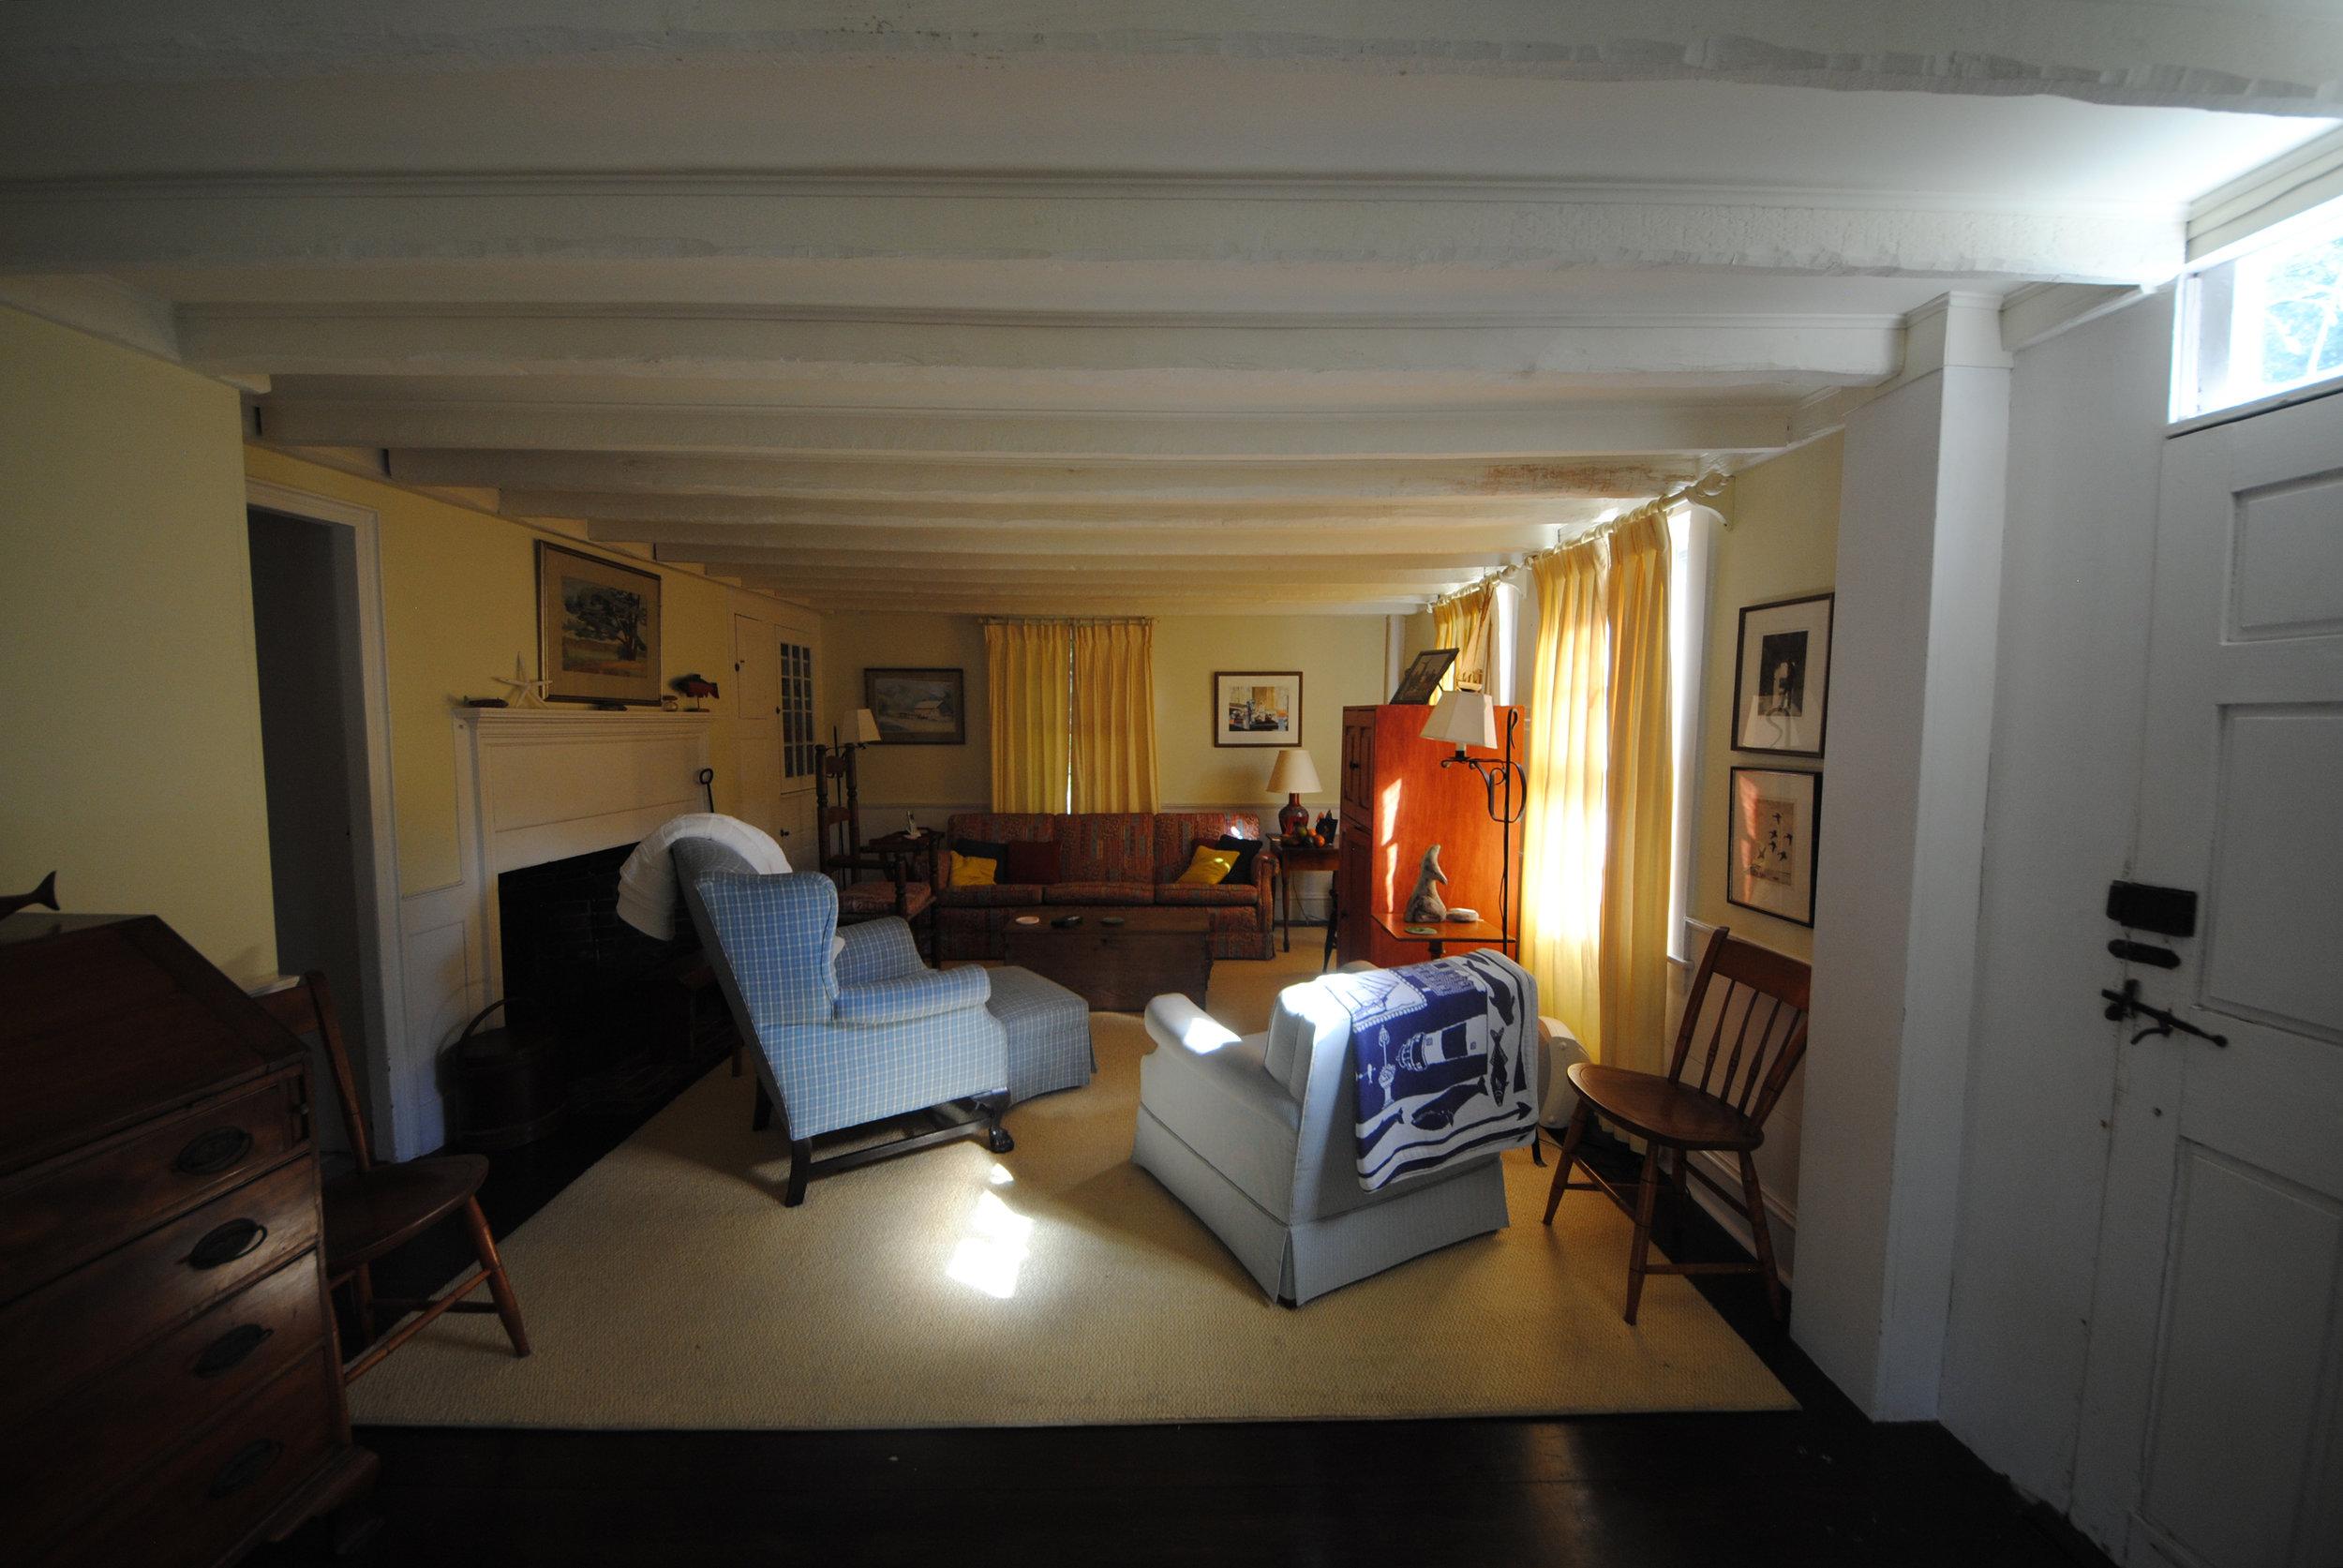 Living room renovation before